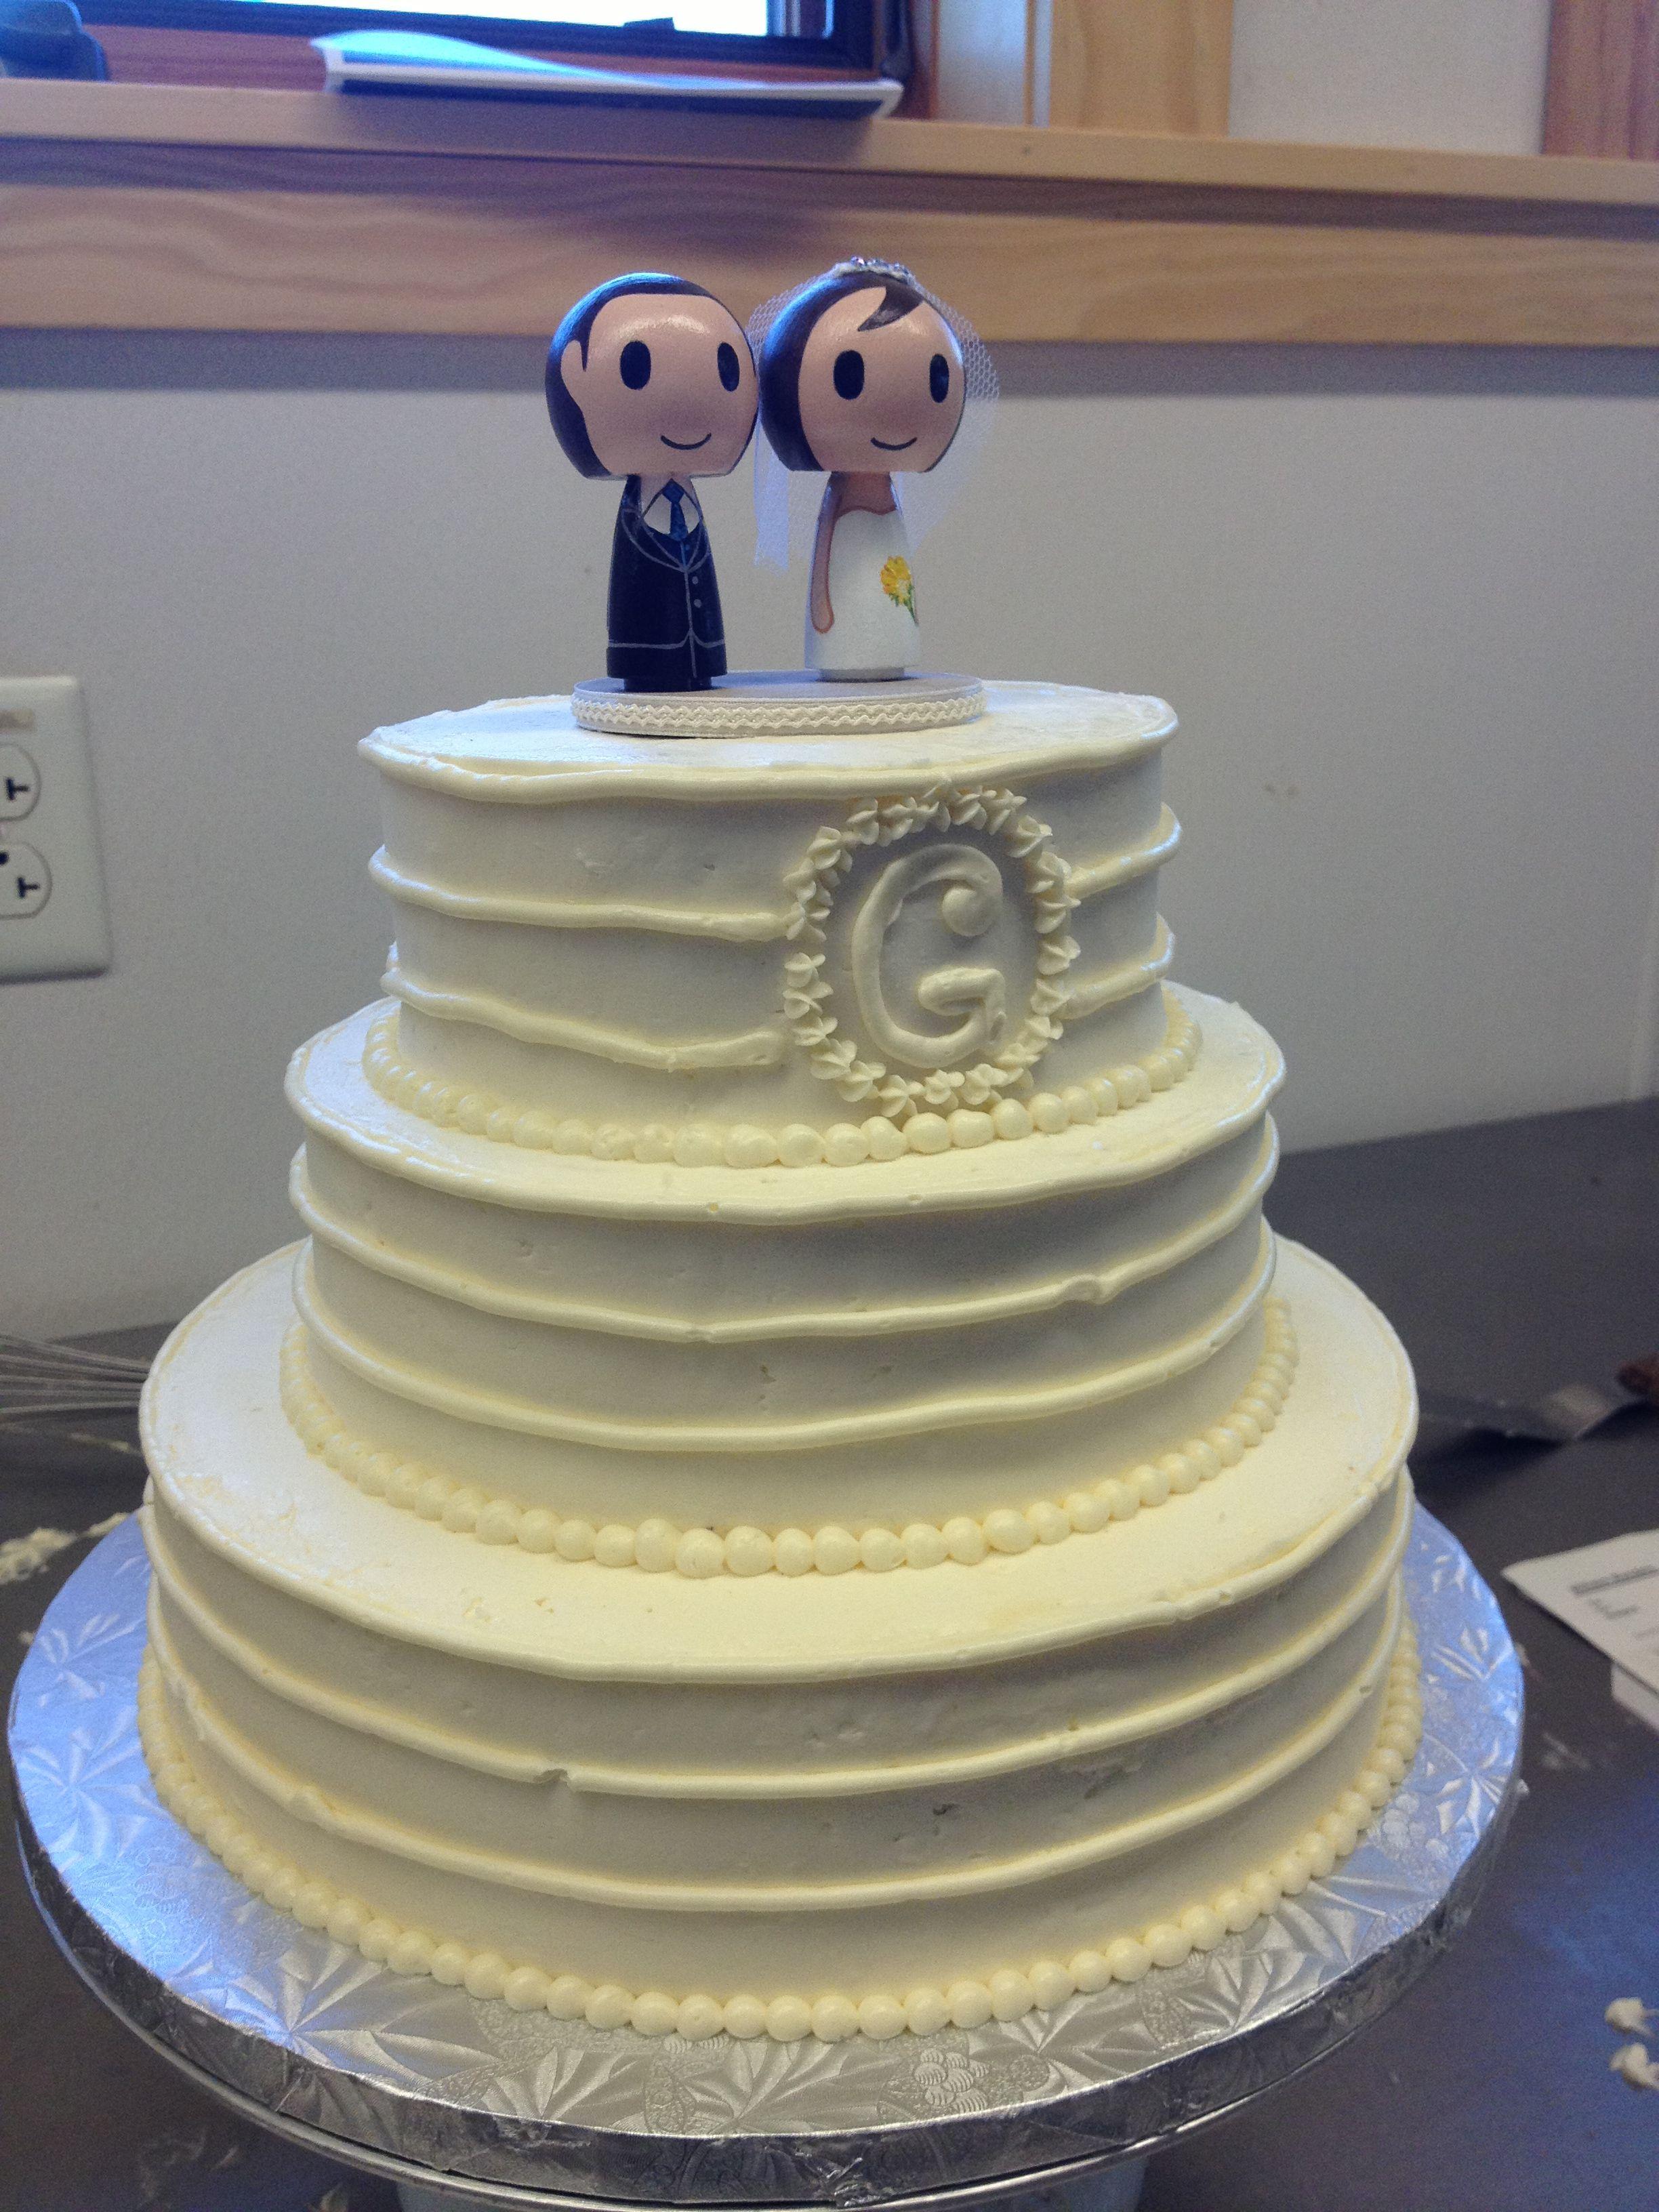 Animal Crossing Cake Topper Wedding Cake Wedding Cake Toppers